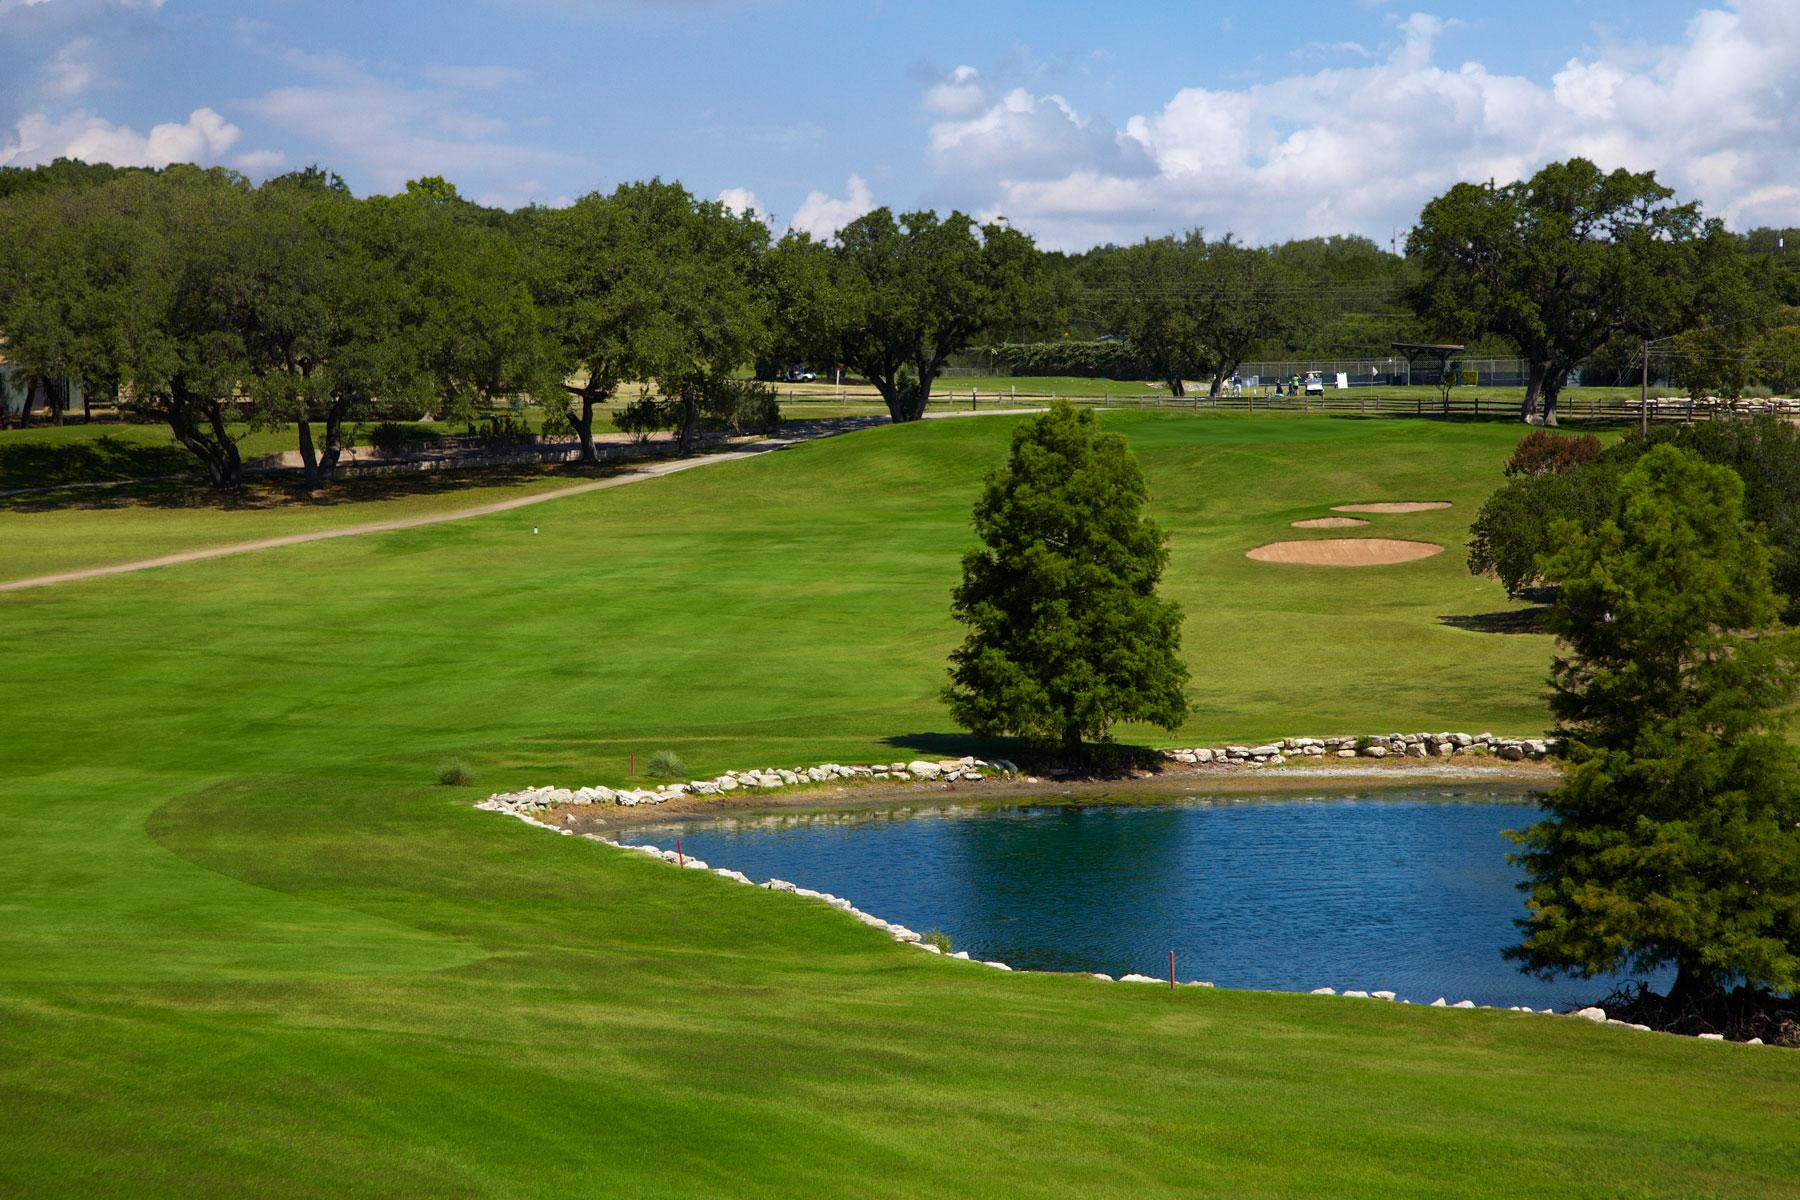 Live Oak Golf Course in Lakeway on Lake Travis